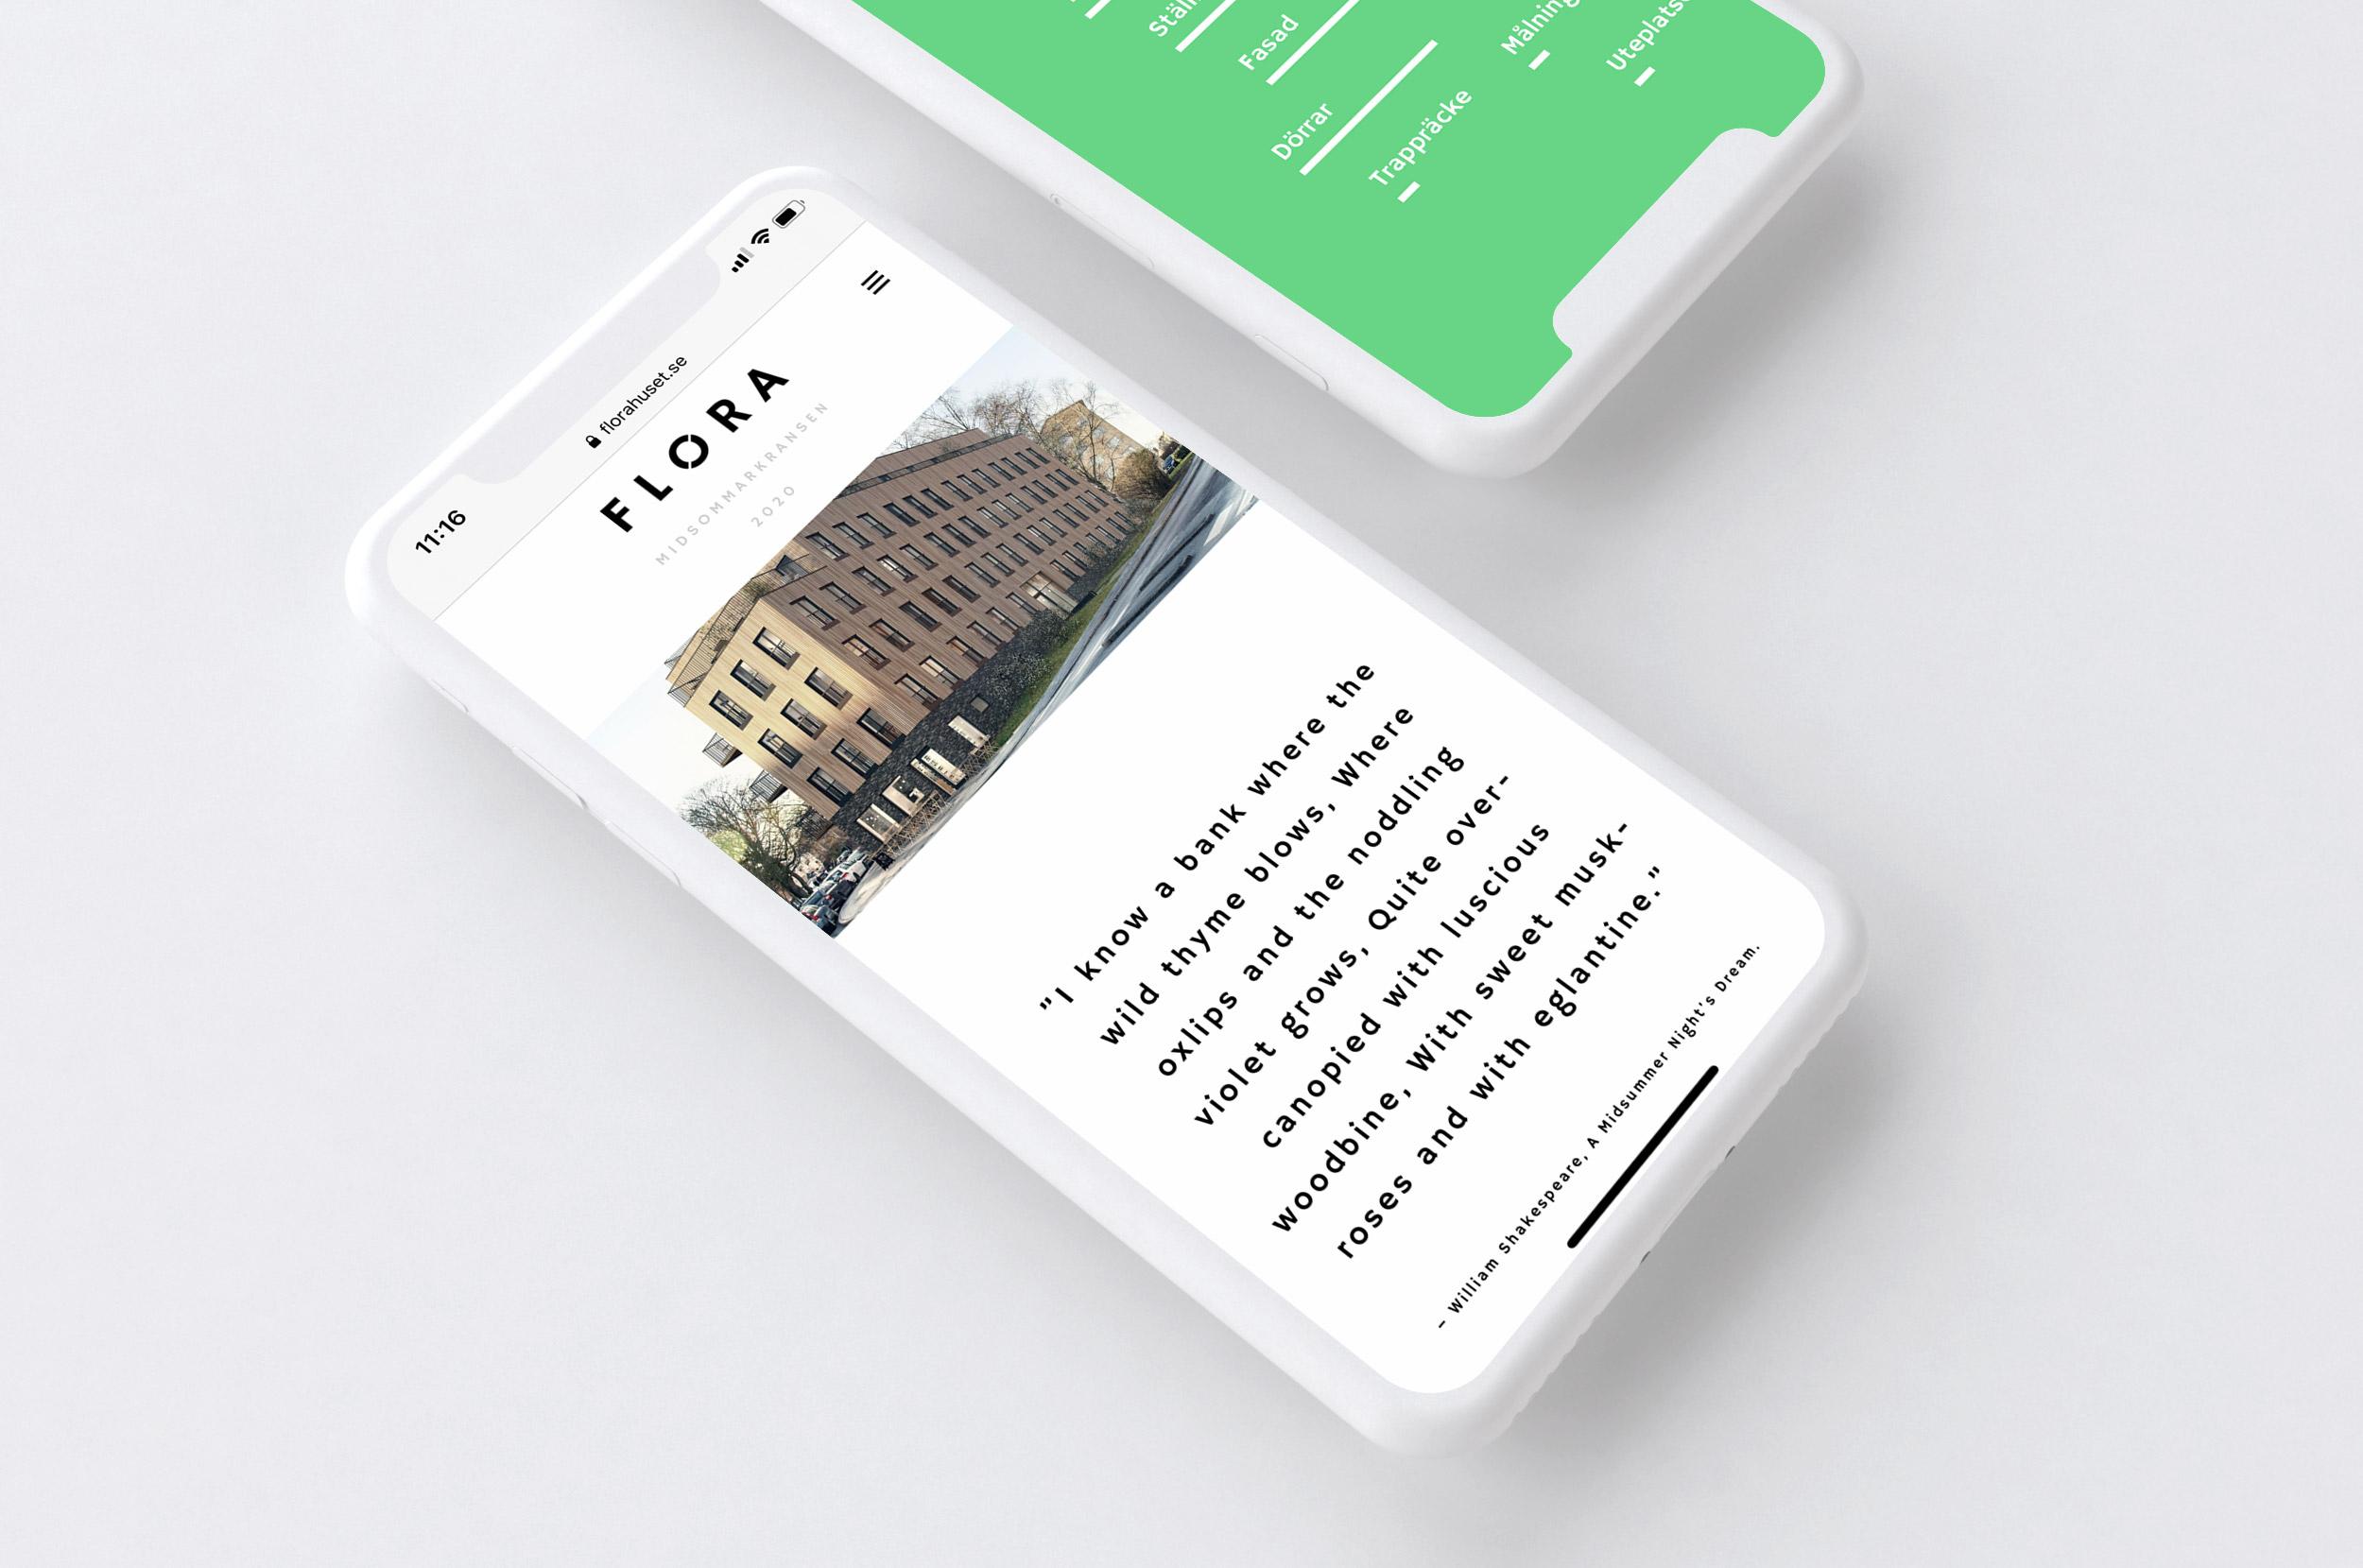 Flora bostadsrätter Wonderfour digital